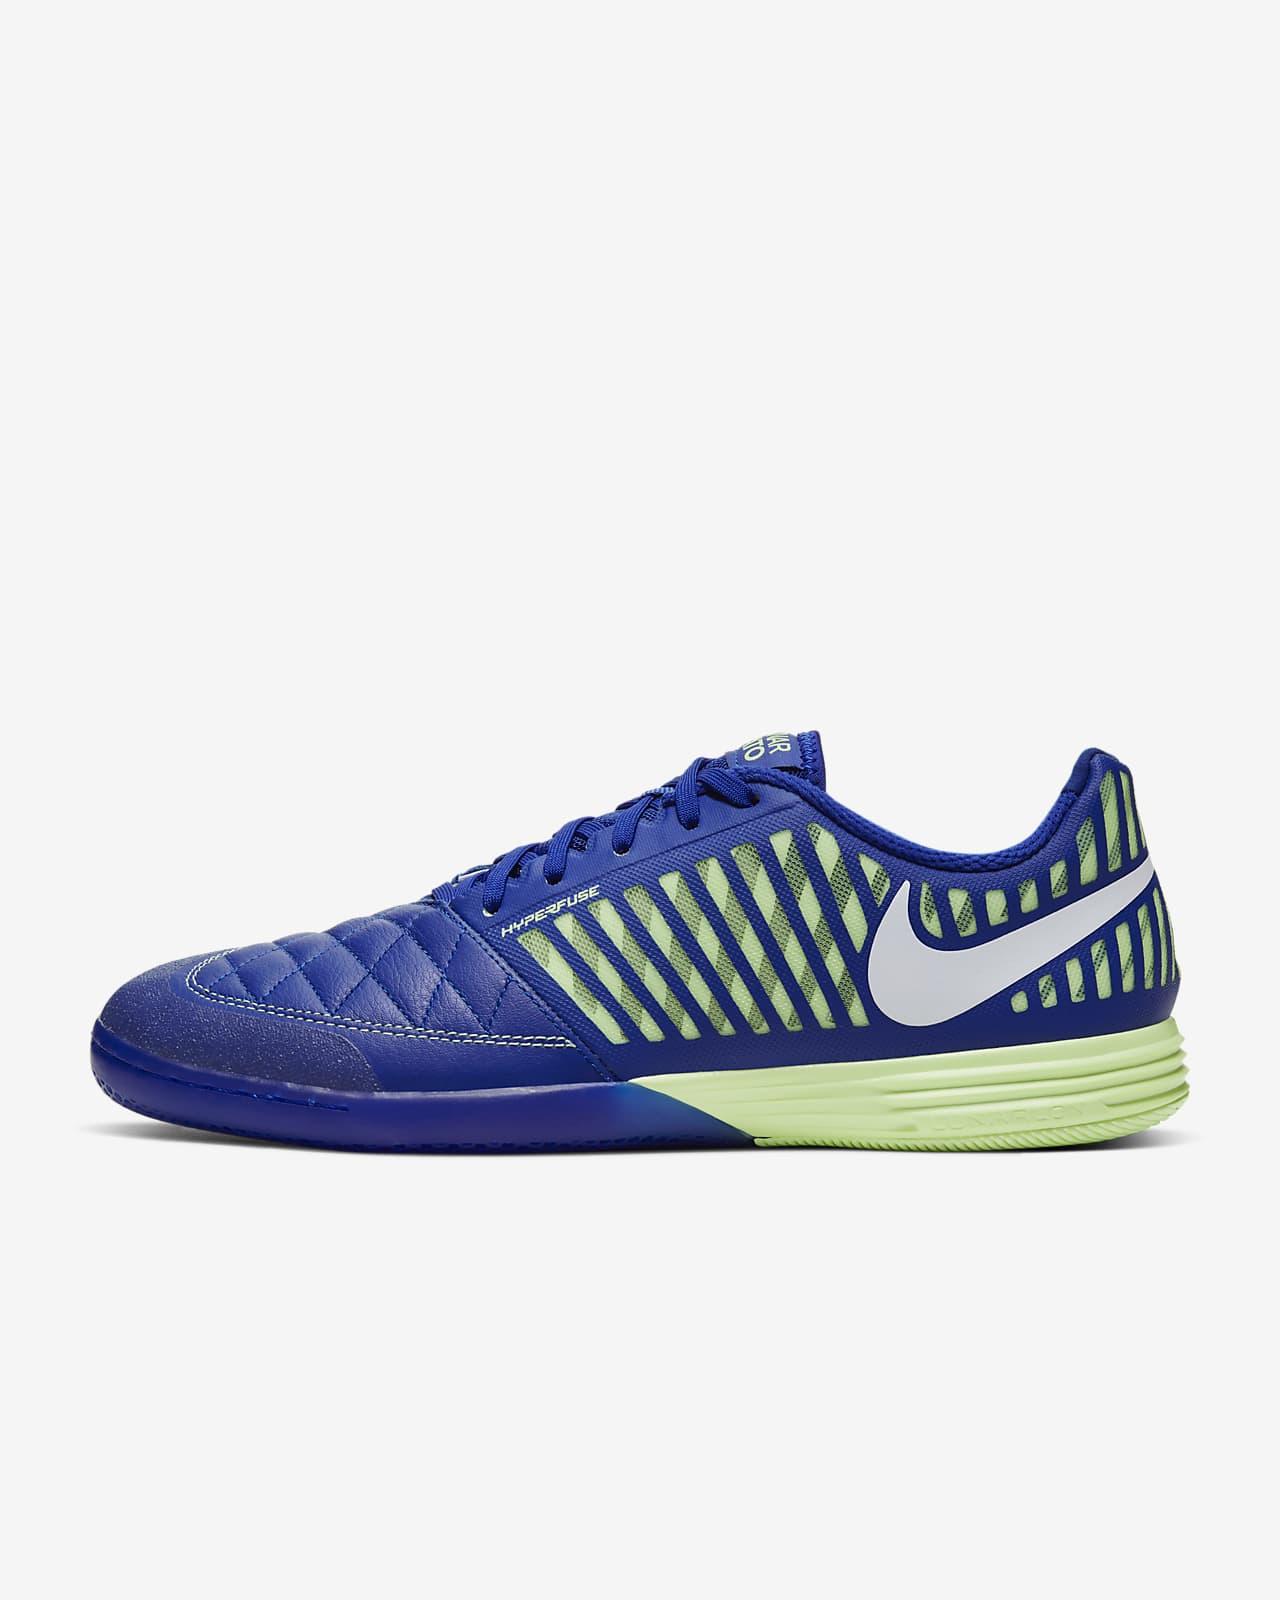 Nike Lunar Gato II IC Indoor Court